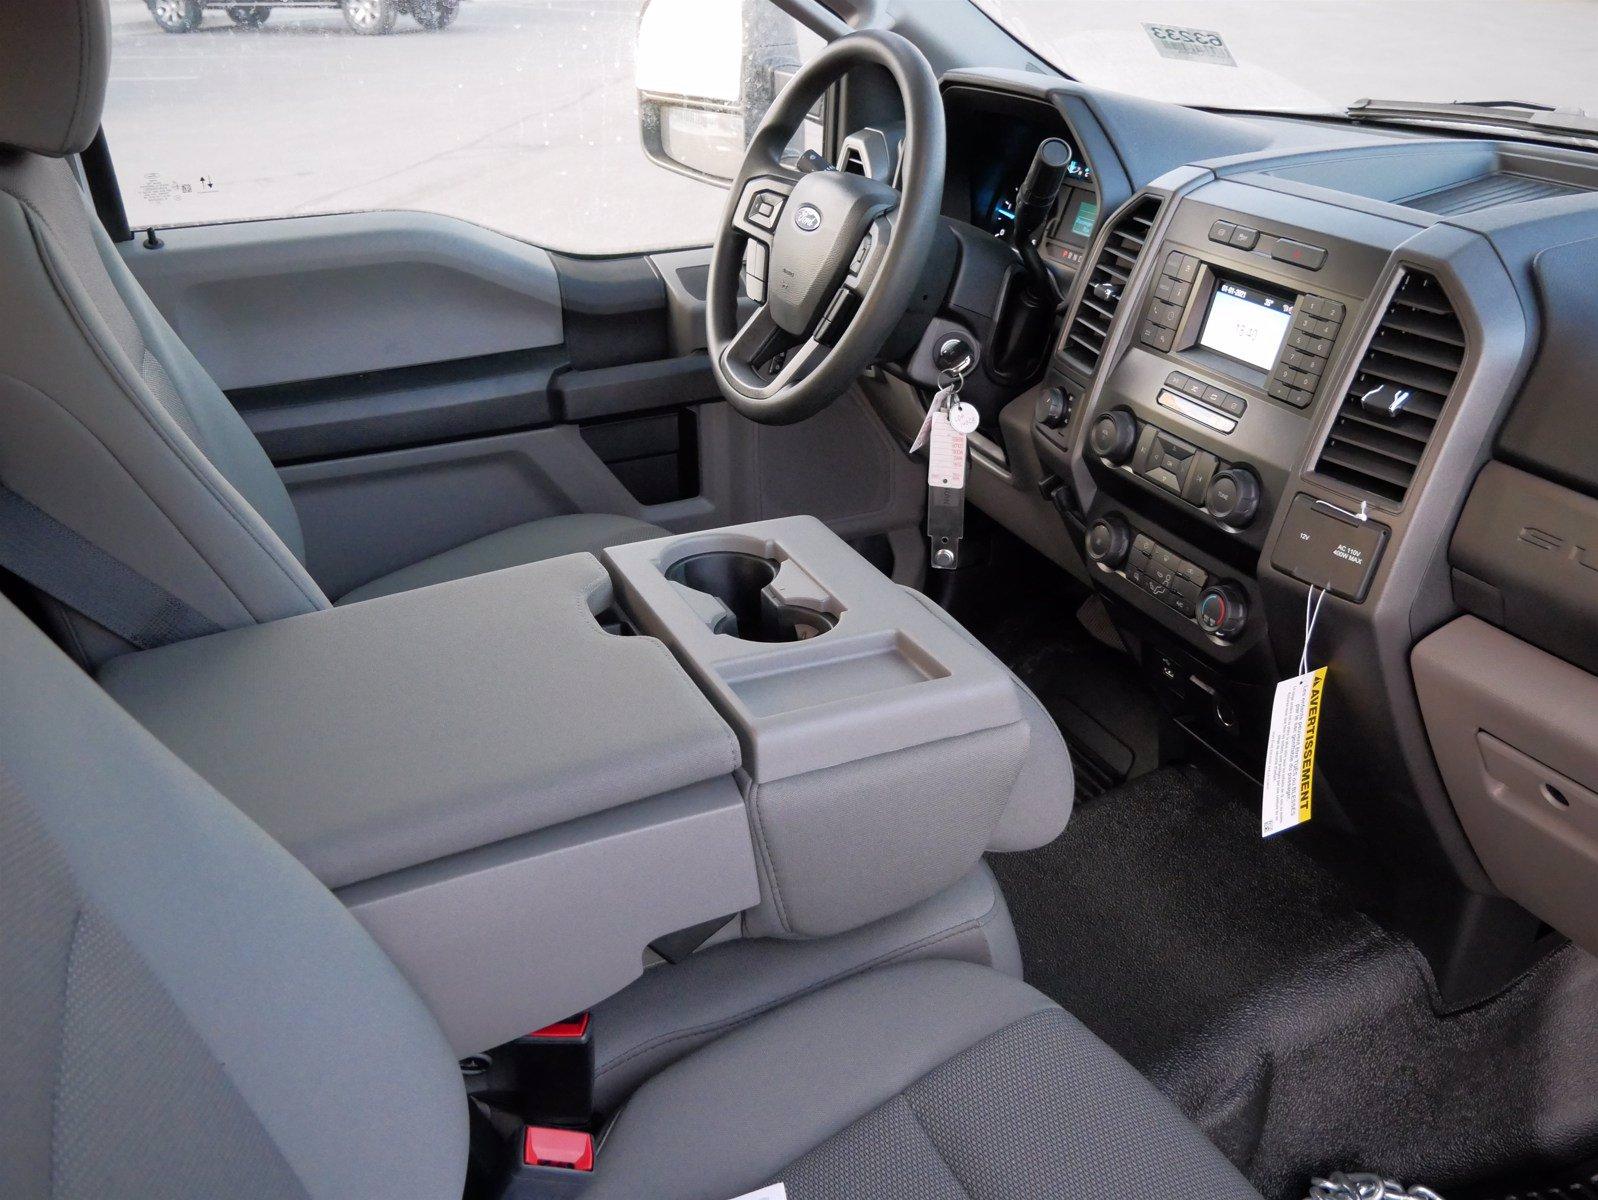 2020 Ford F-550 Regular Cab DRW 4x4, Scelzi Dump Body #63233 - photo 21